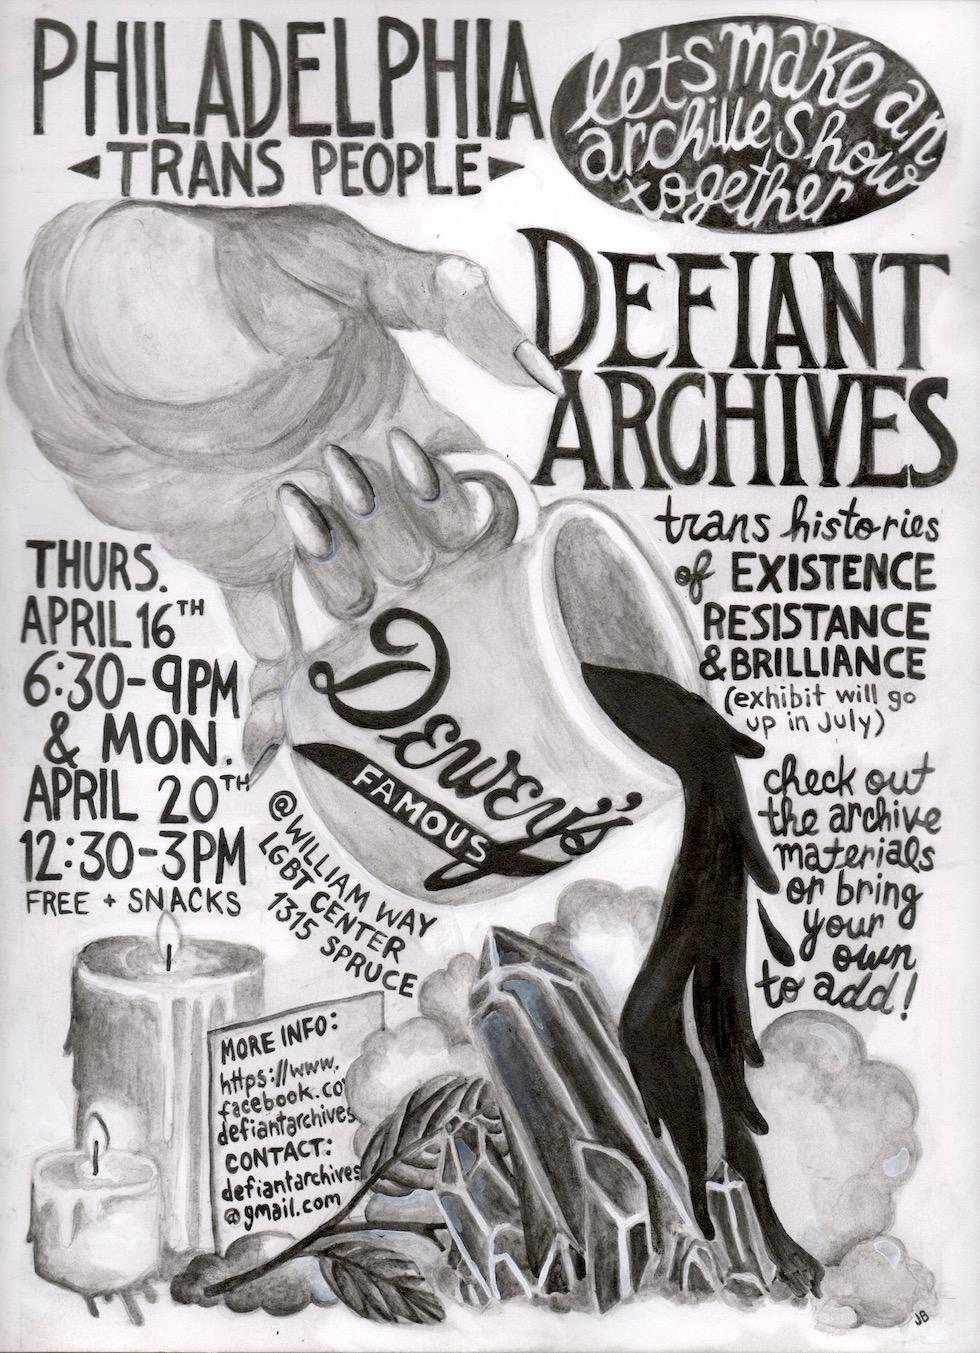 Defiant Archives